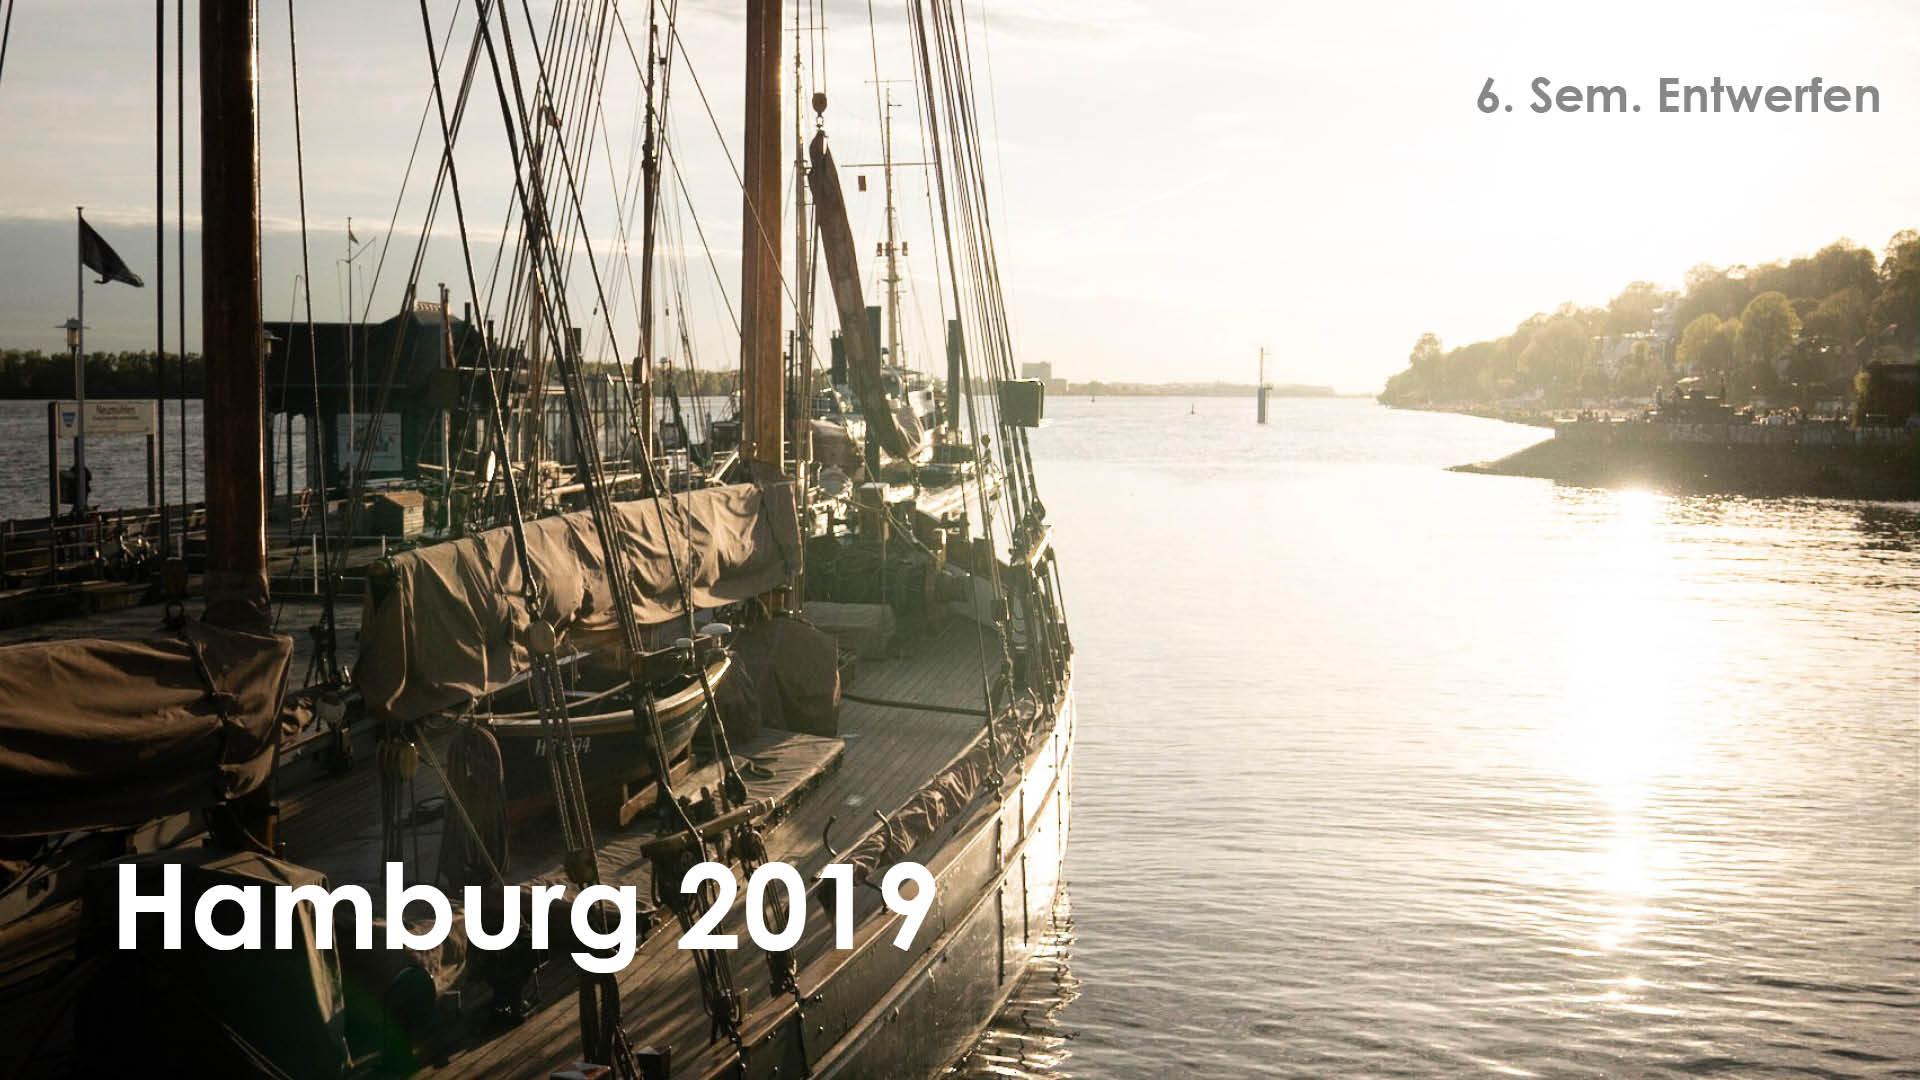 01 Exkursion Hamburg 2019